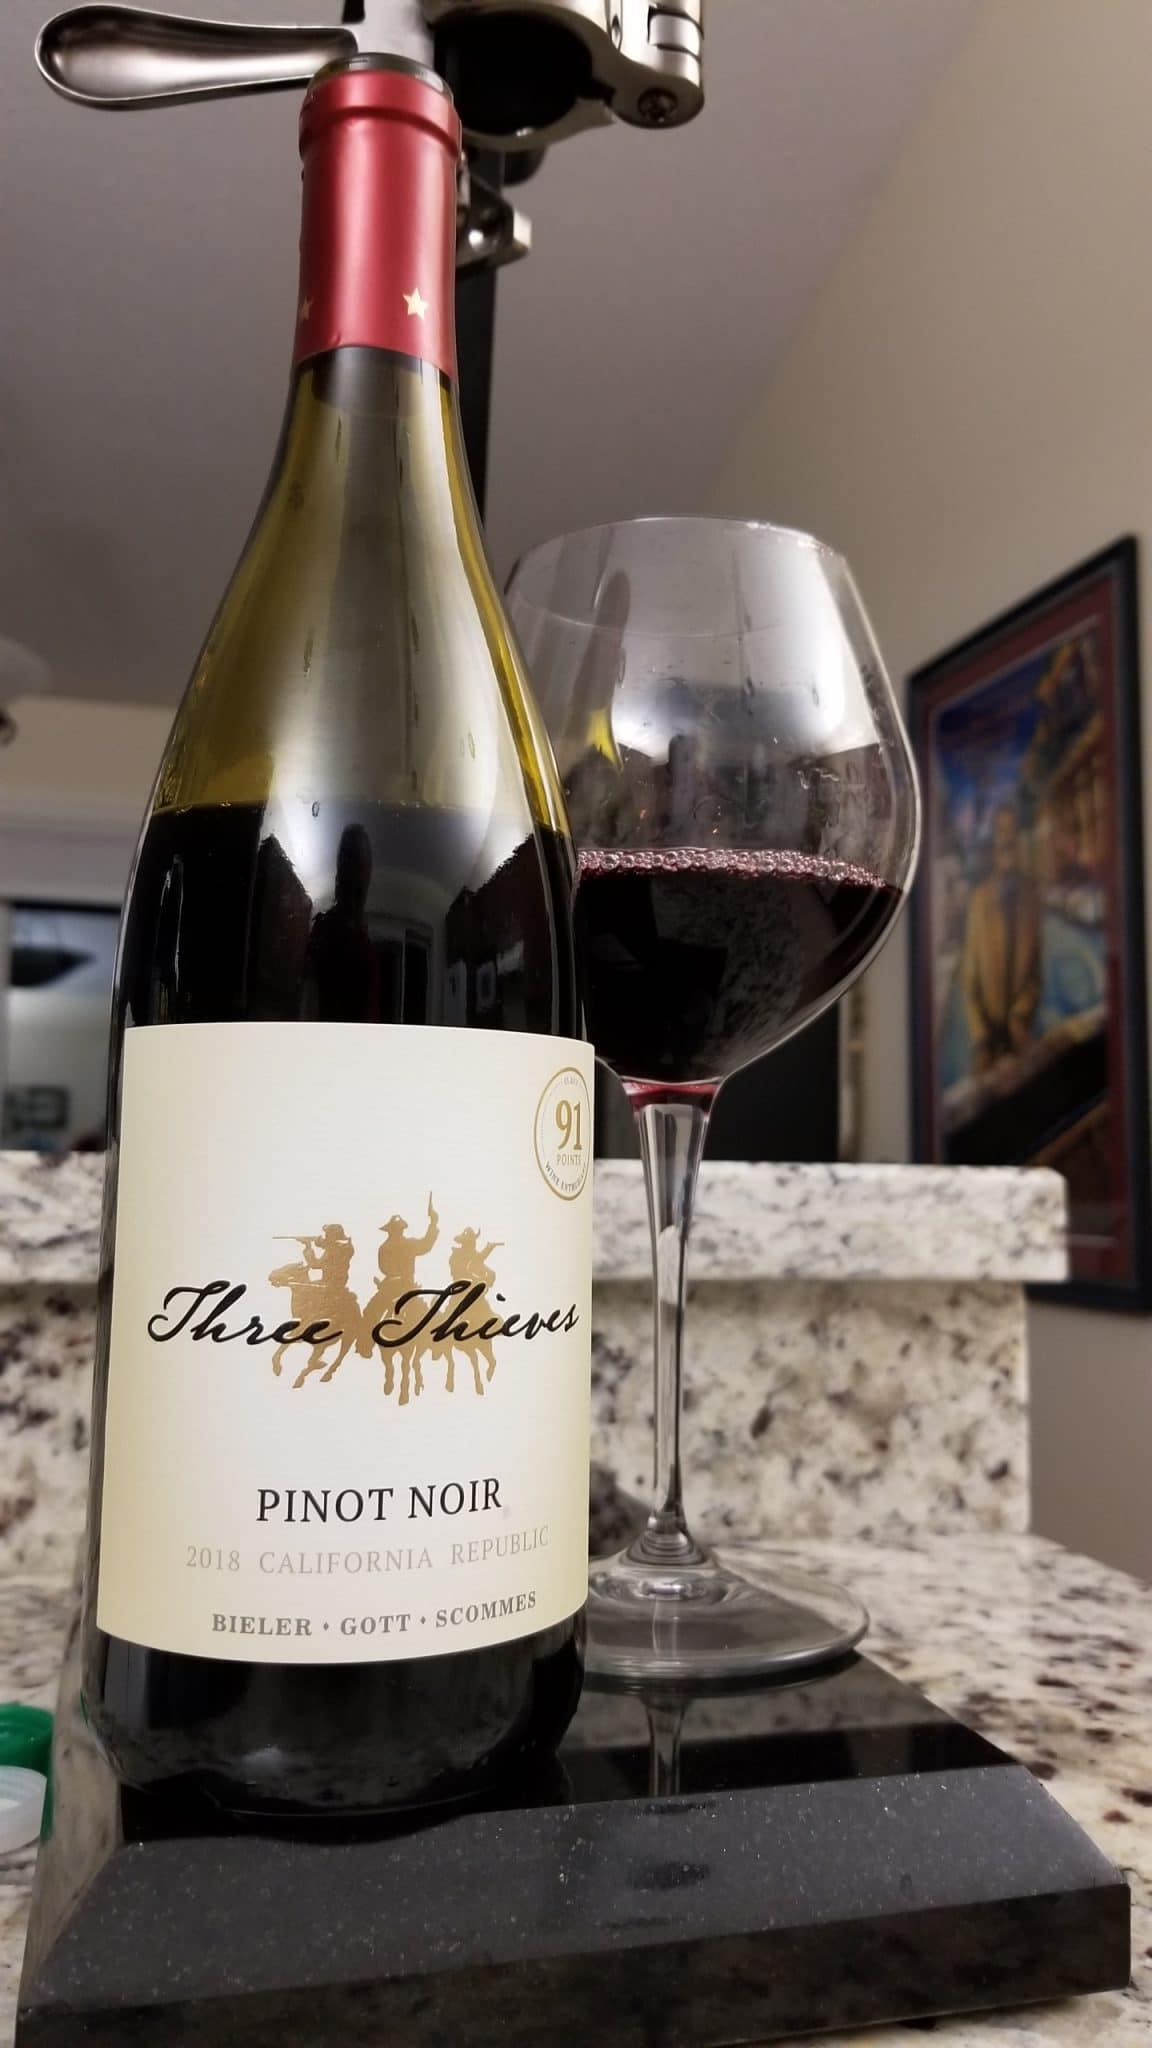 $17.95 - Three Thieves Pinot Noir 2018